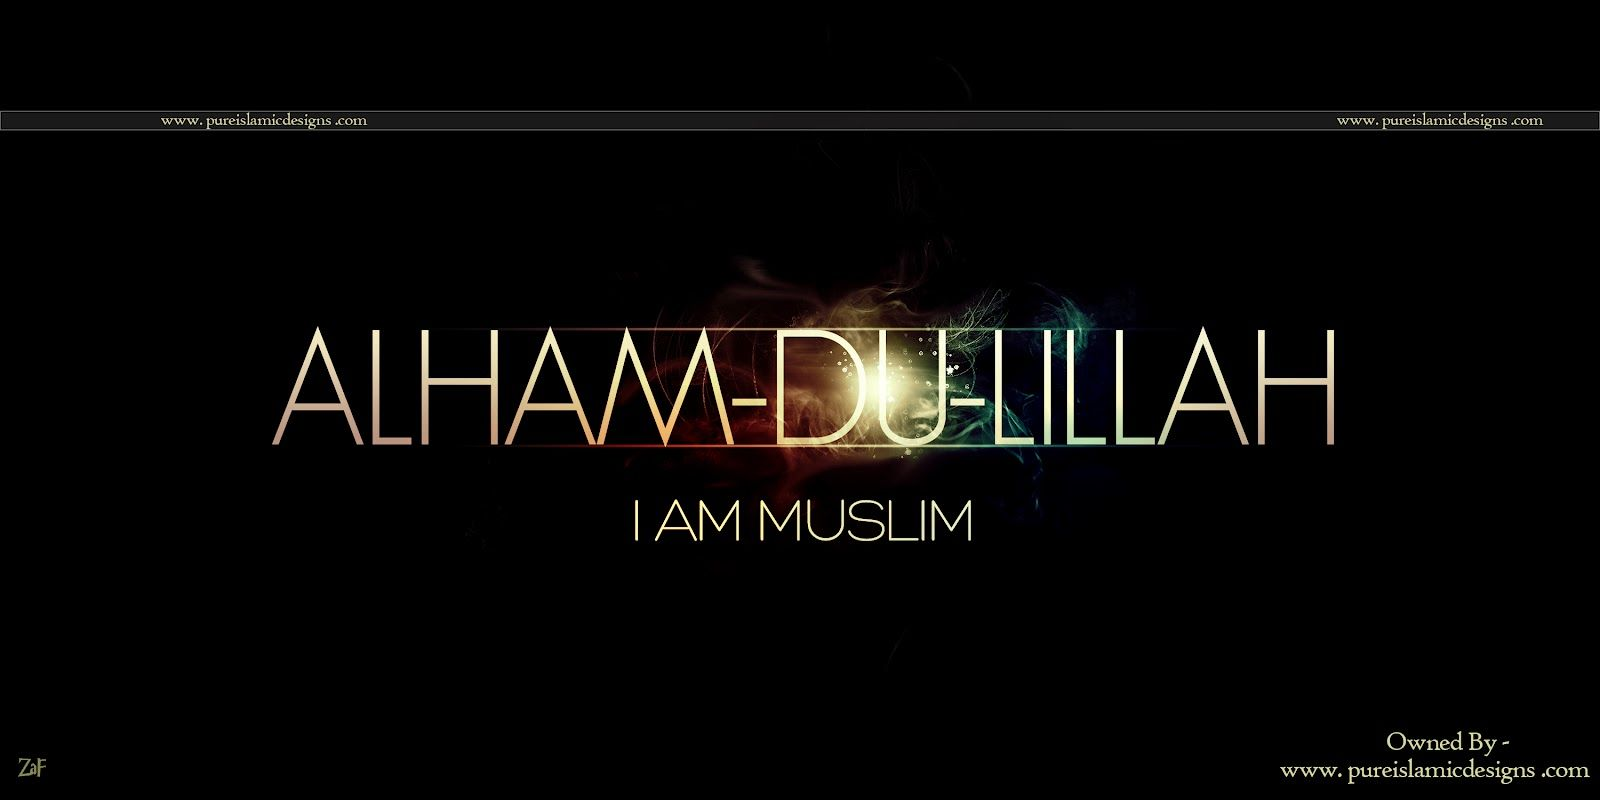 I AM MUSLIM! Alhamdulillah Islamic quotes, Fb timeline